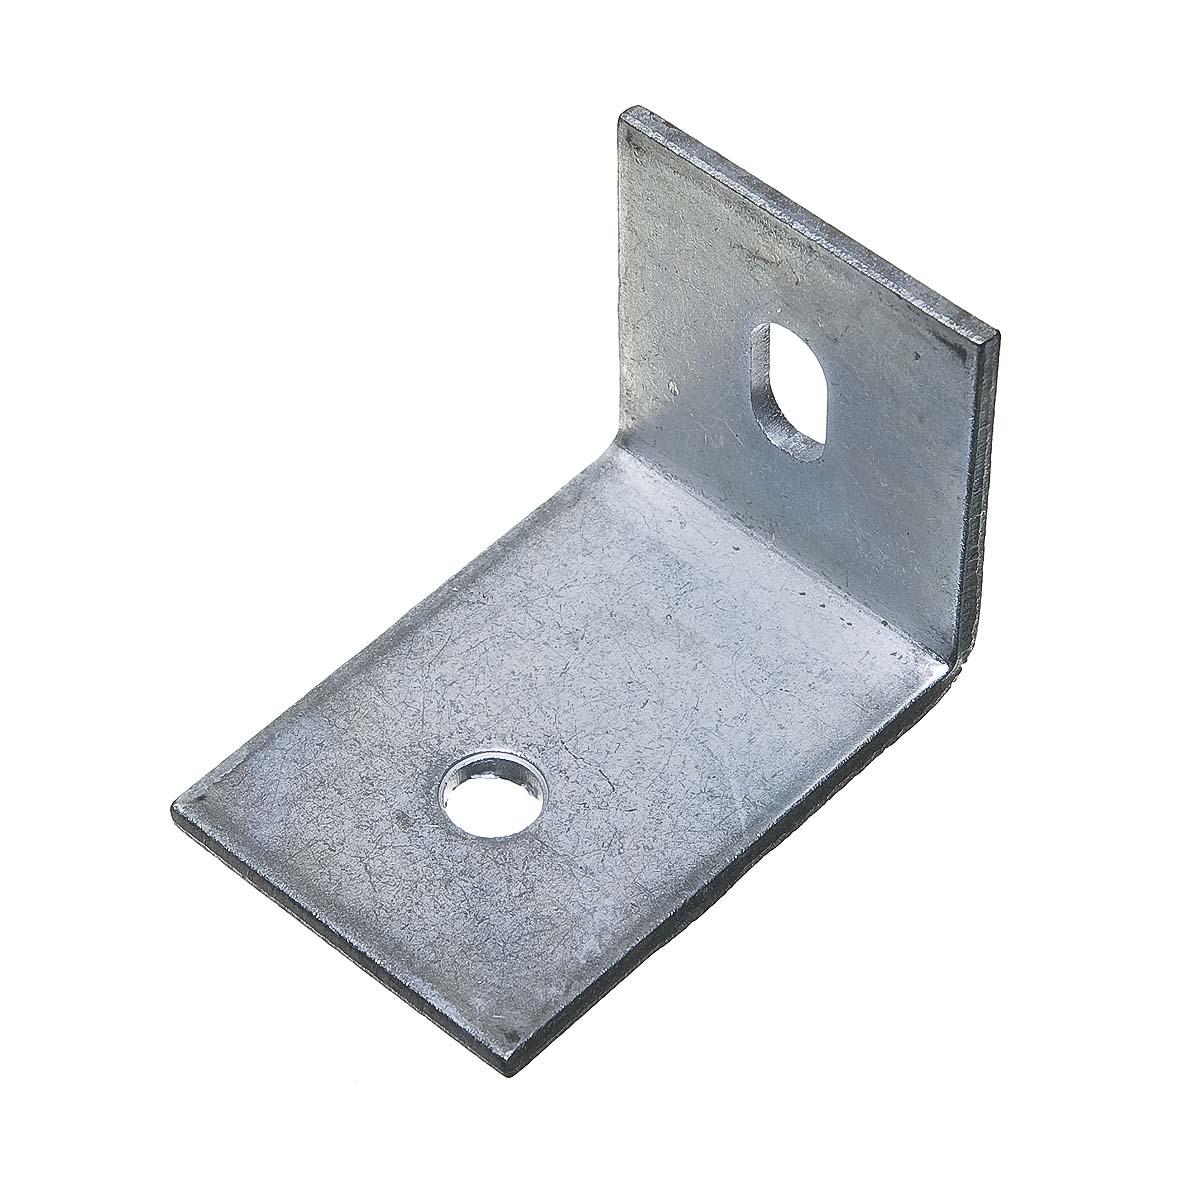 Уголок для бетона оцинкованный 90х60х60х5 мм